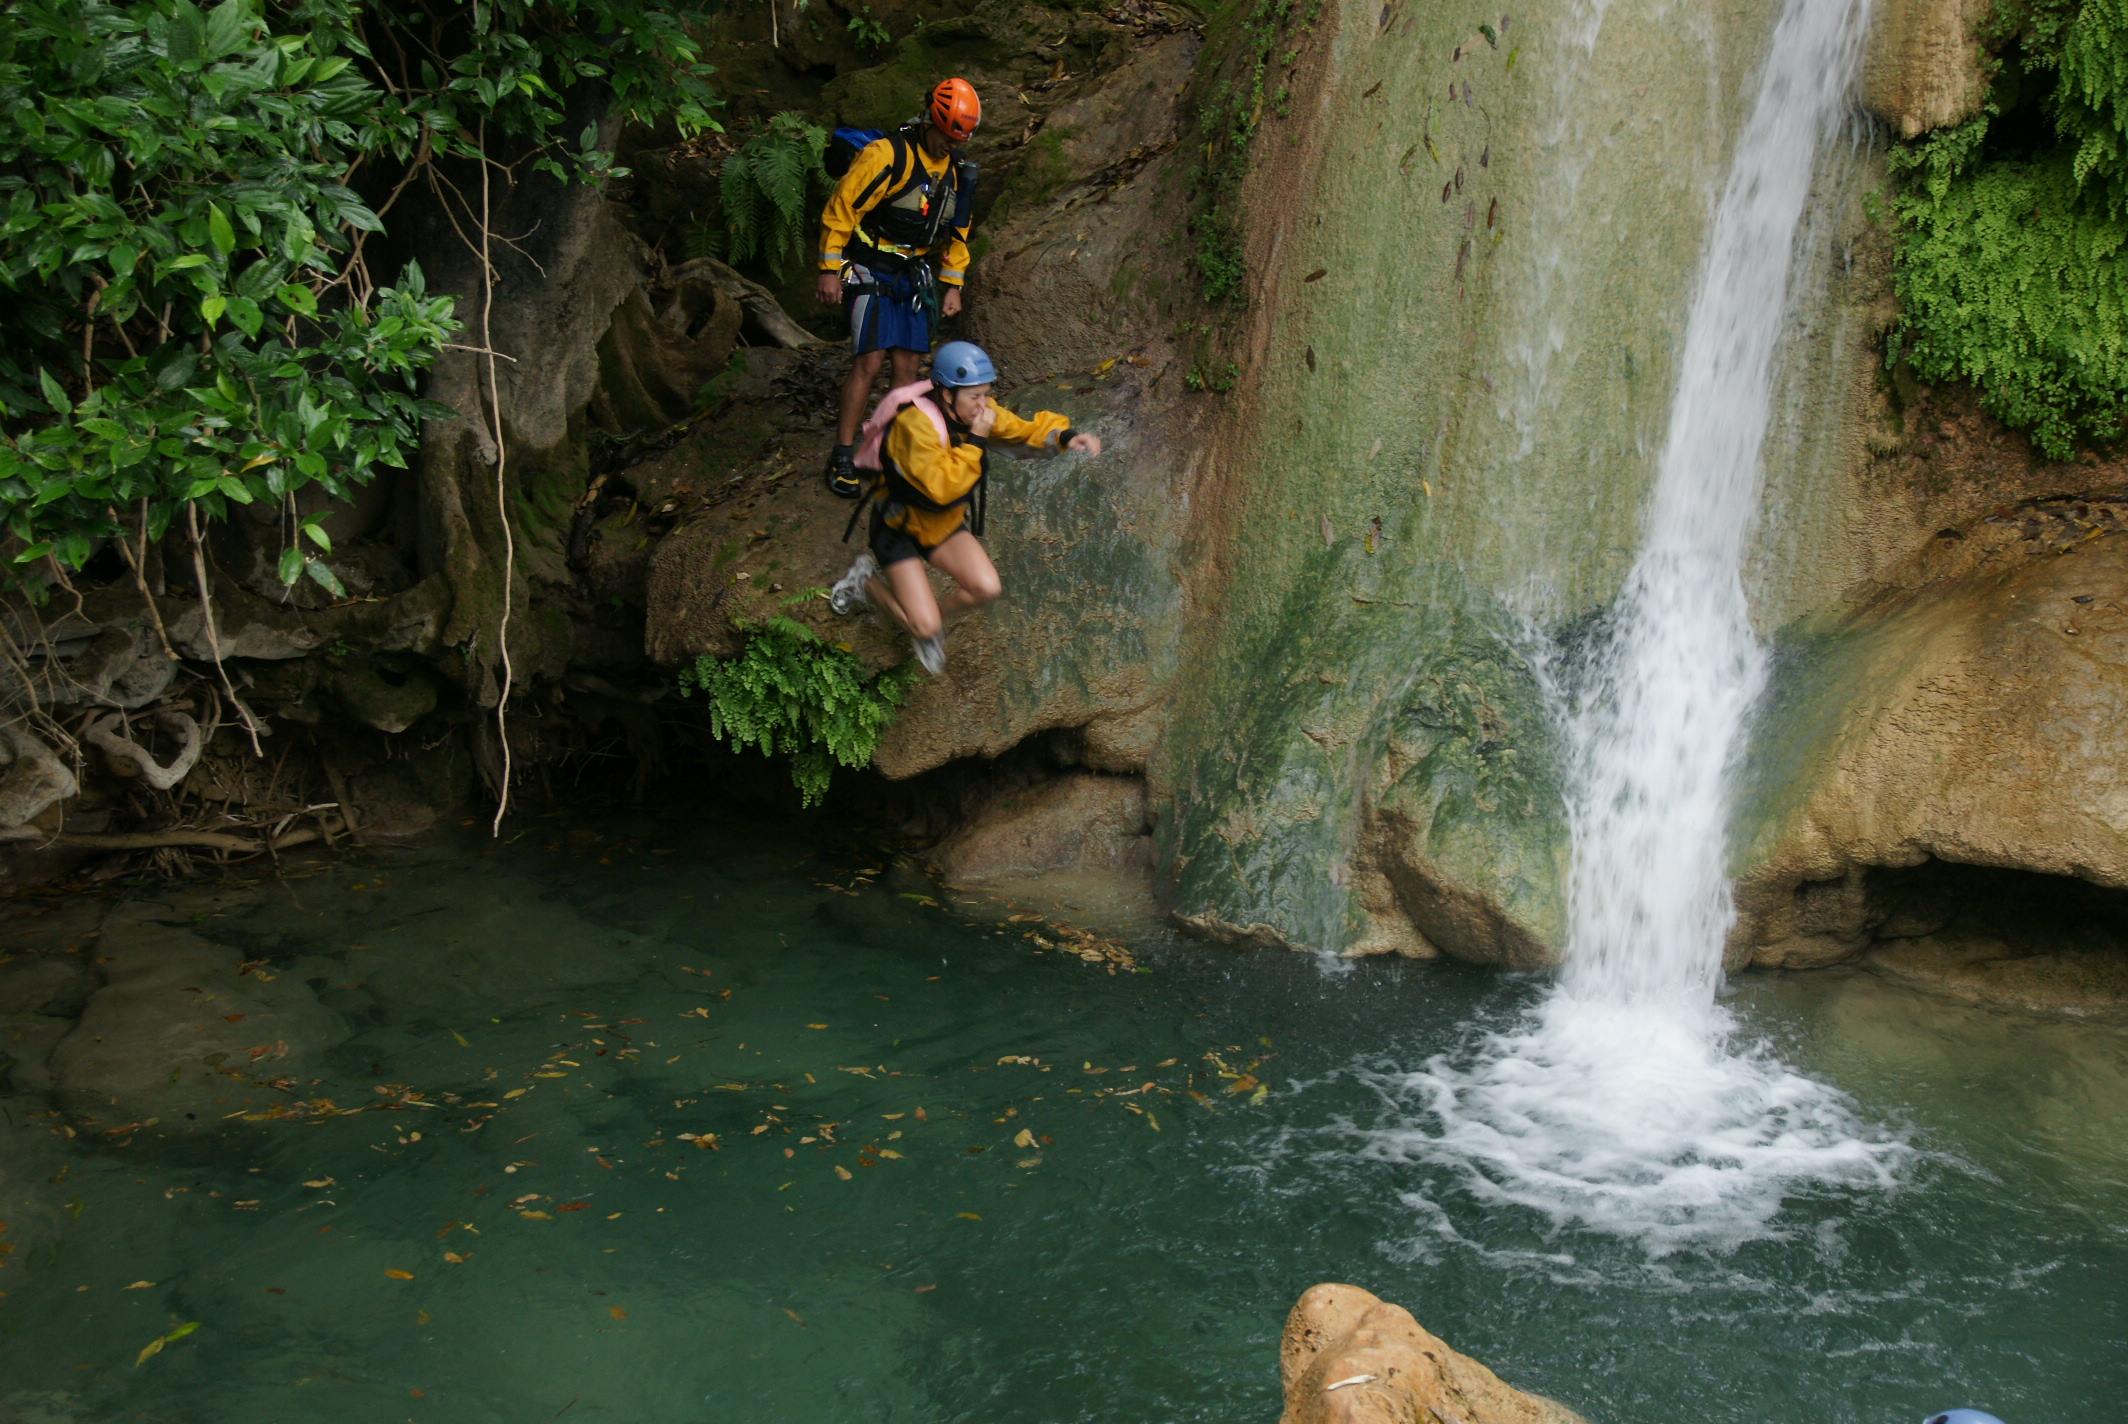 Canyonnering Torrentismo Barranquismo Morelos TAxco Mil cascadas